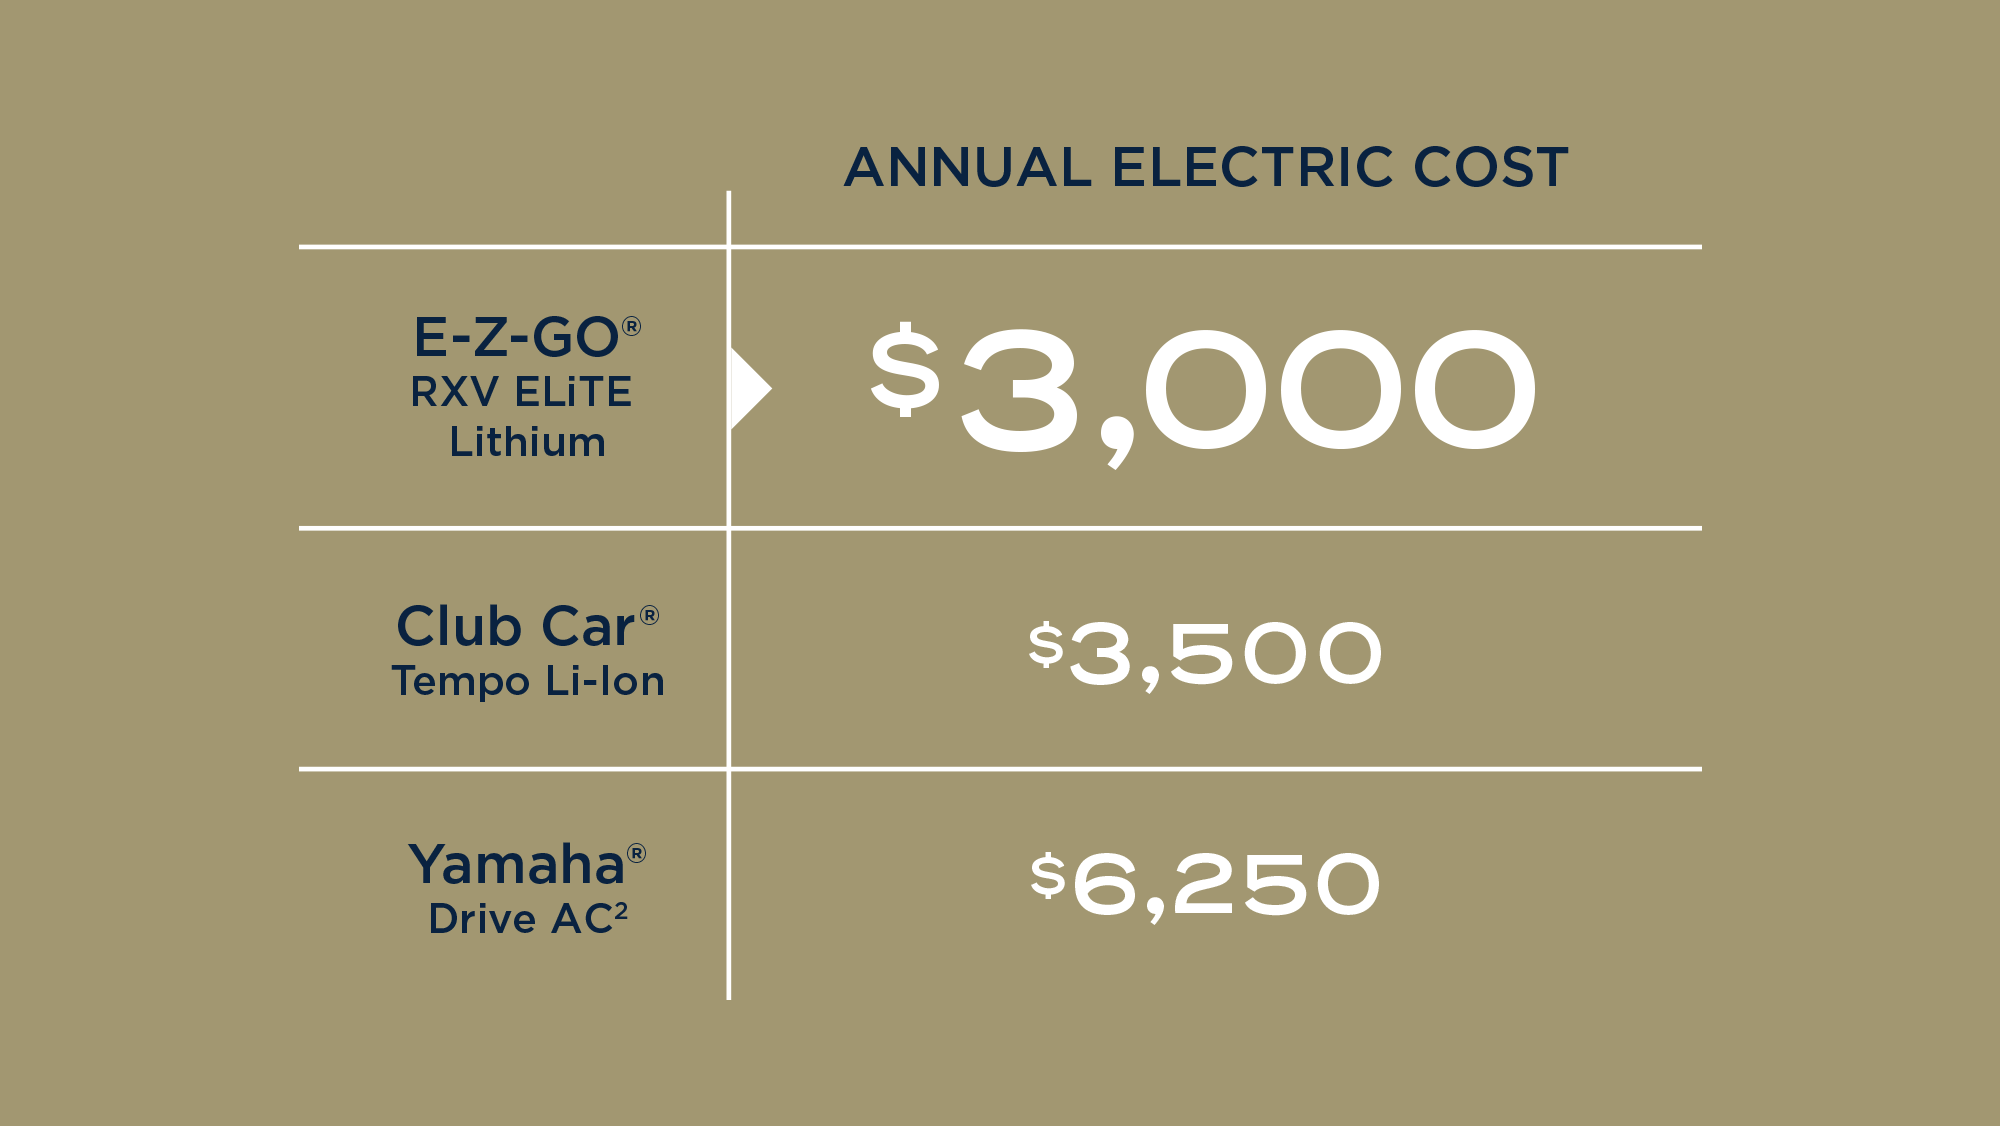 Annual electric cost. EZGO RXV ELiTE Lithium $3,000. Club Car Tempo Li-ion $3,500. Yamaha Drive AC $6,250.